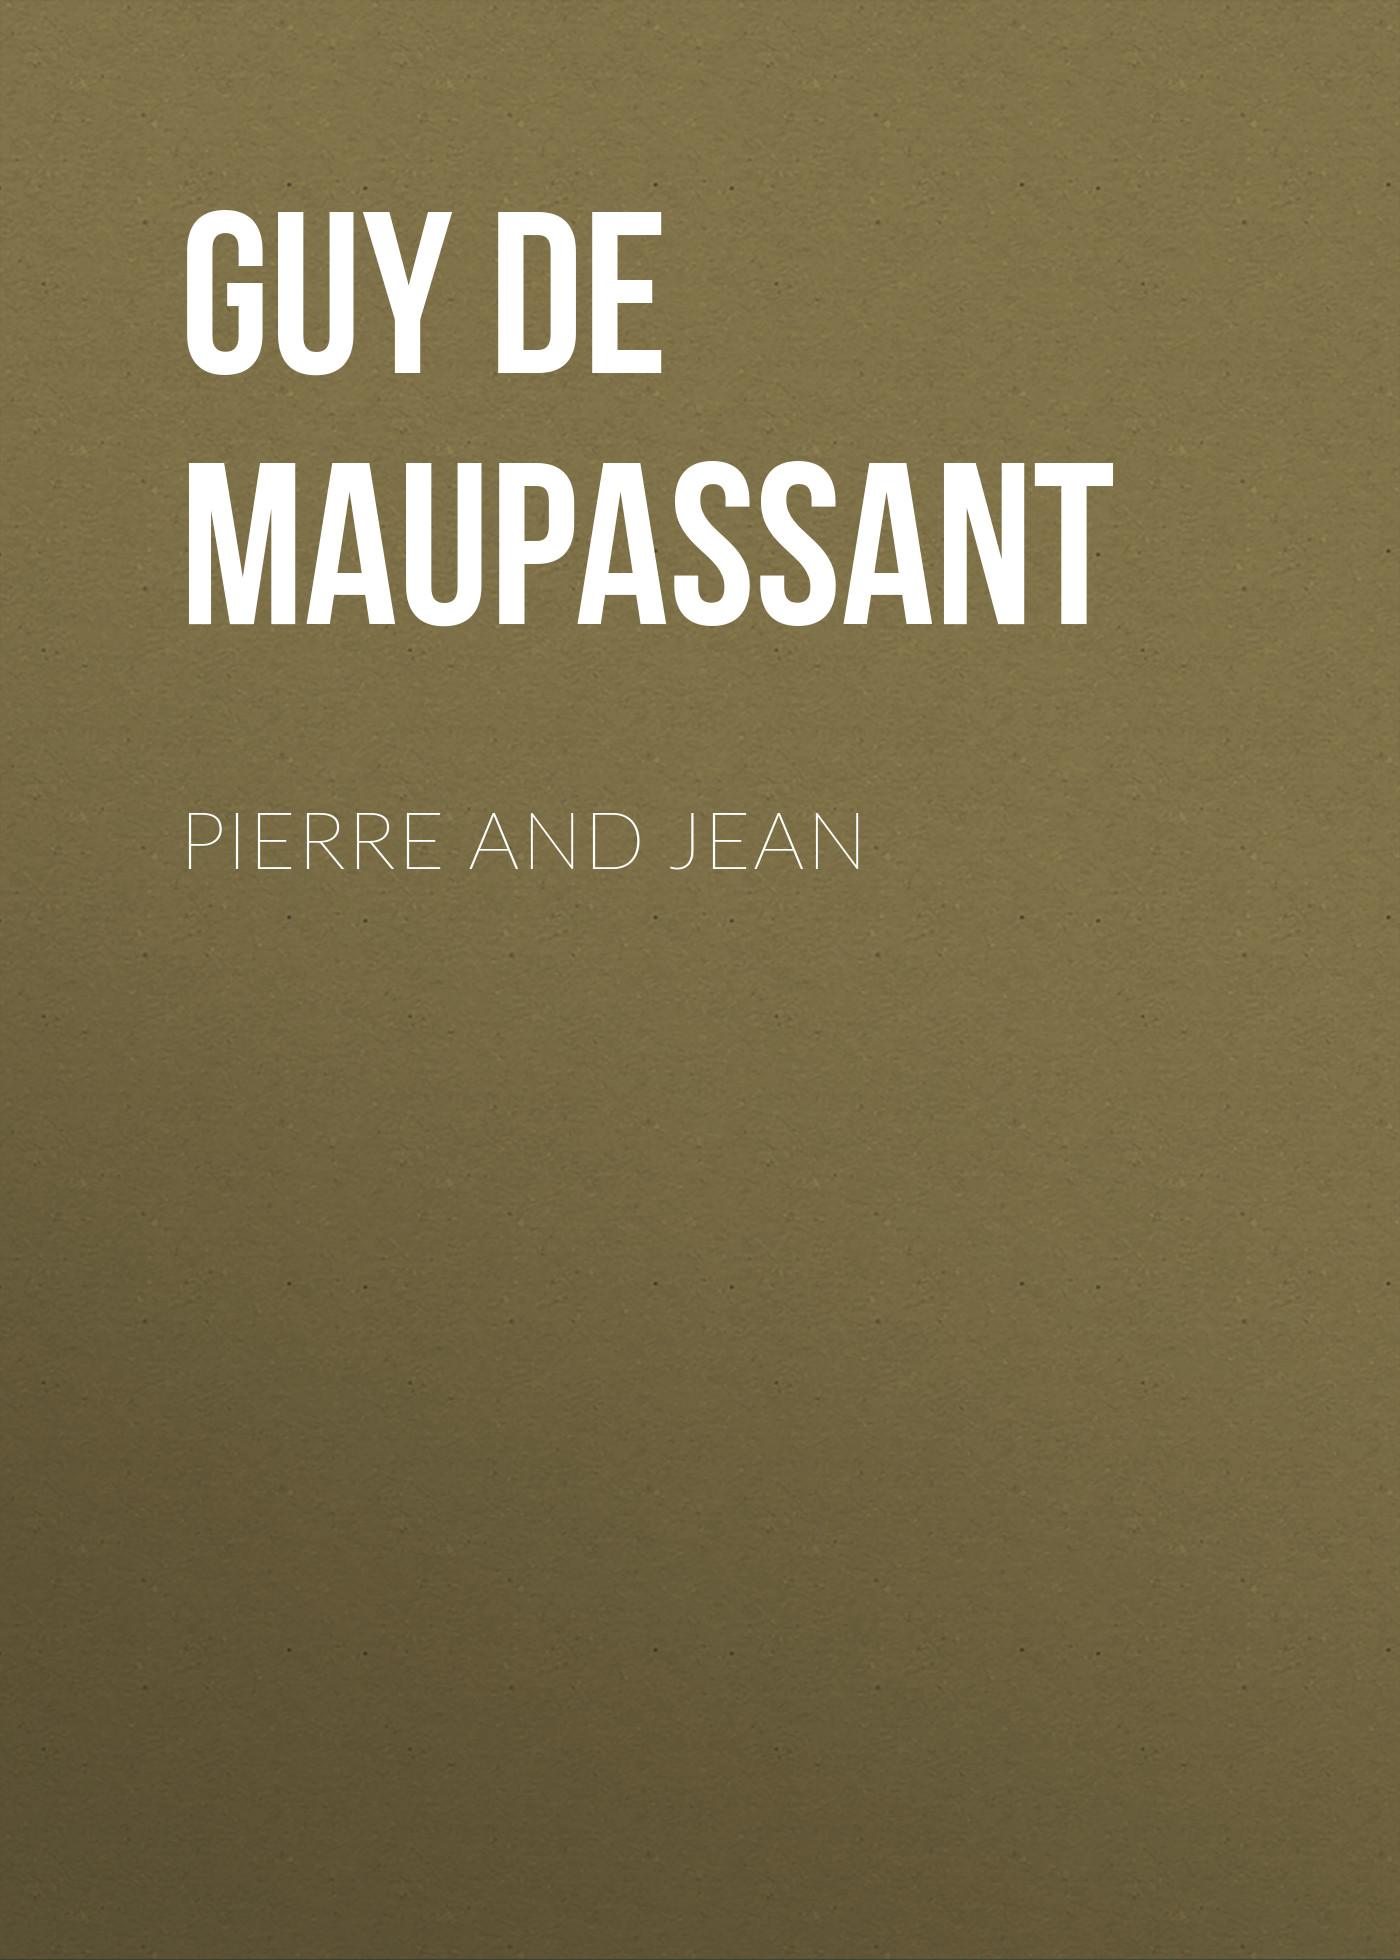 лучшая цена Ги де Мопассан Pierre and Jean